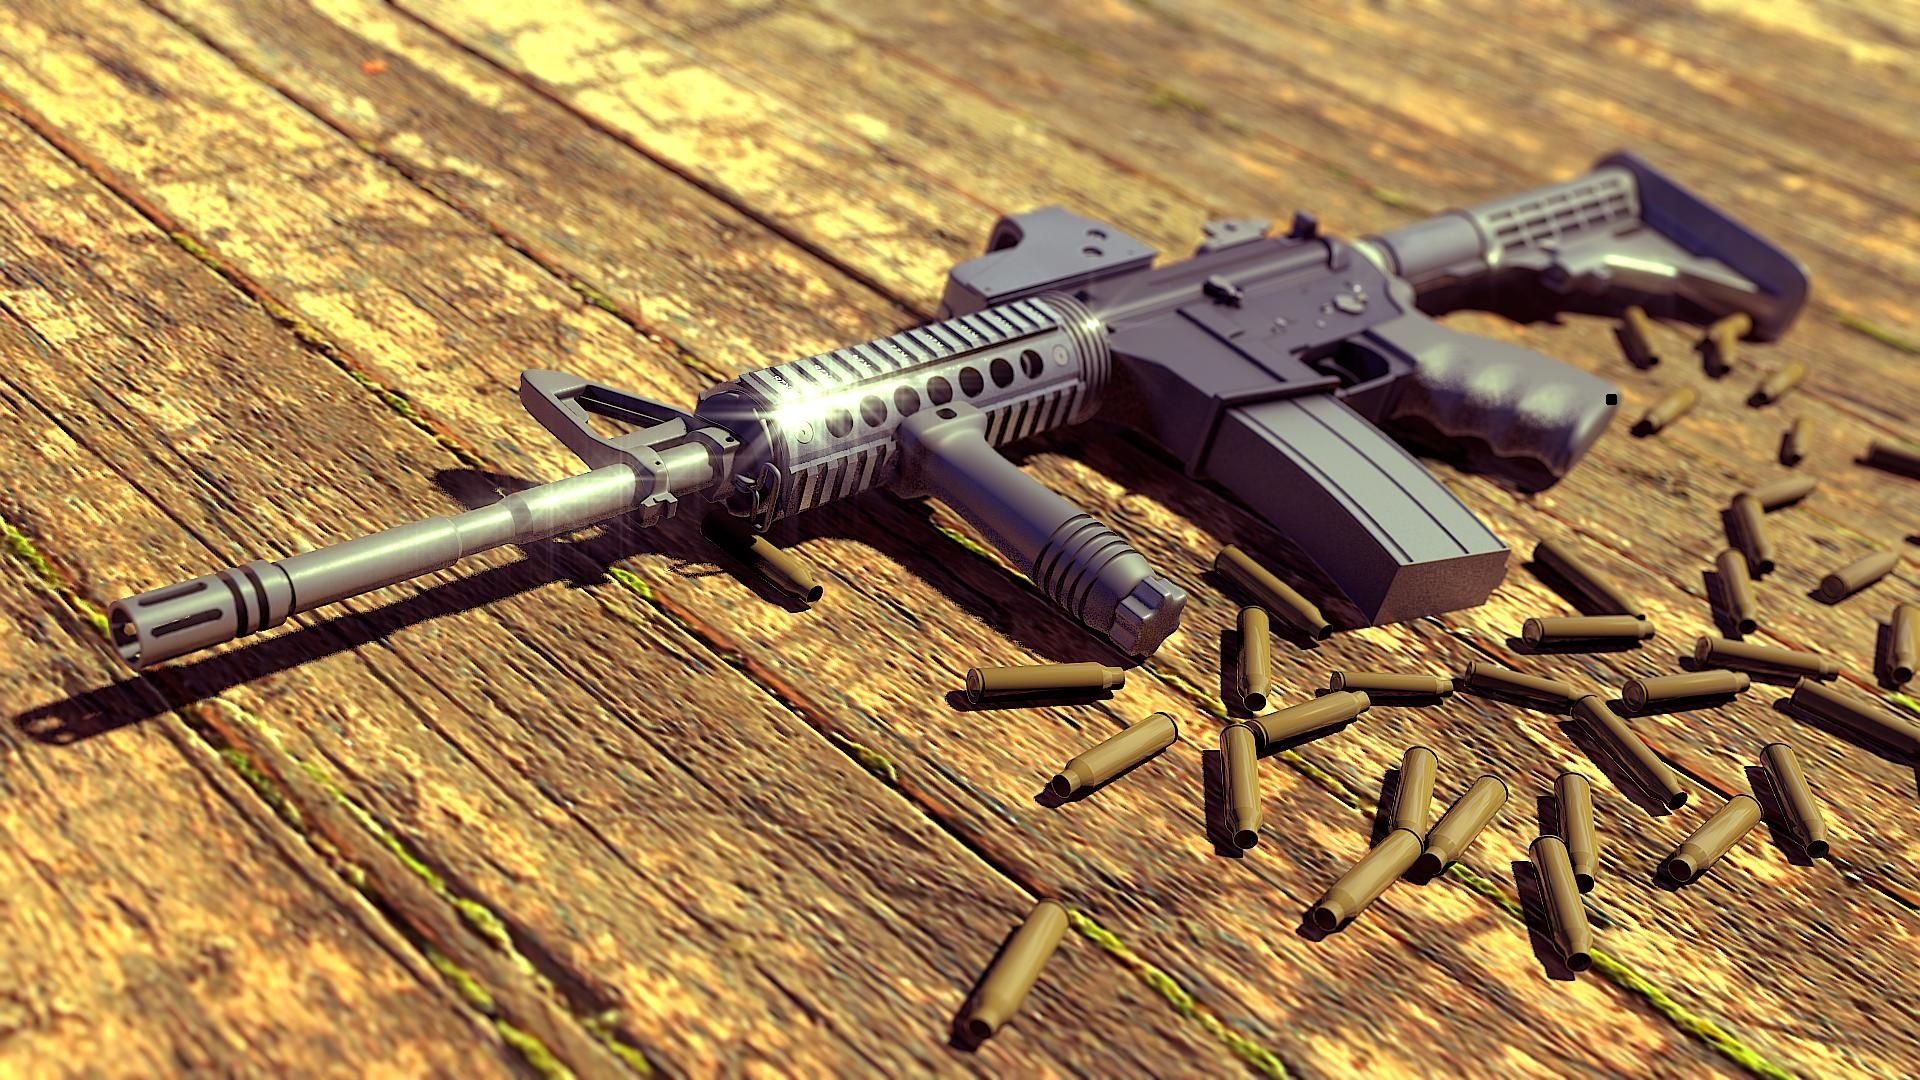 Pin By Adney S On Home Defense Guns Wallpaper Guns High Resolution Wallpapers